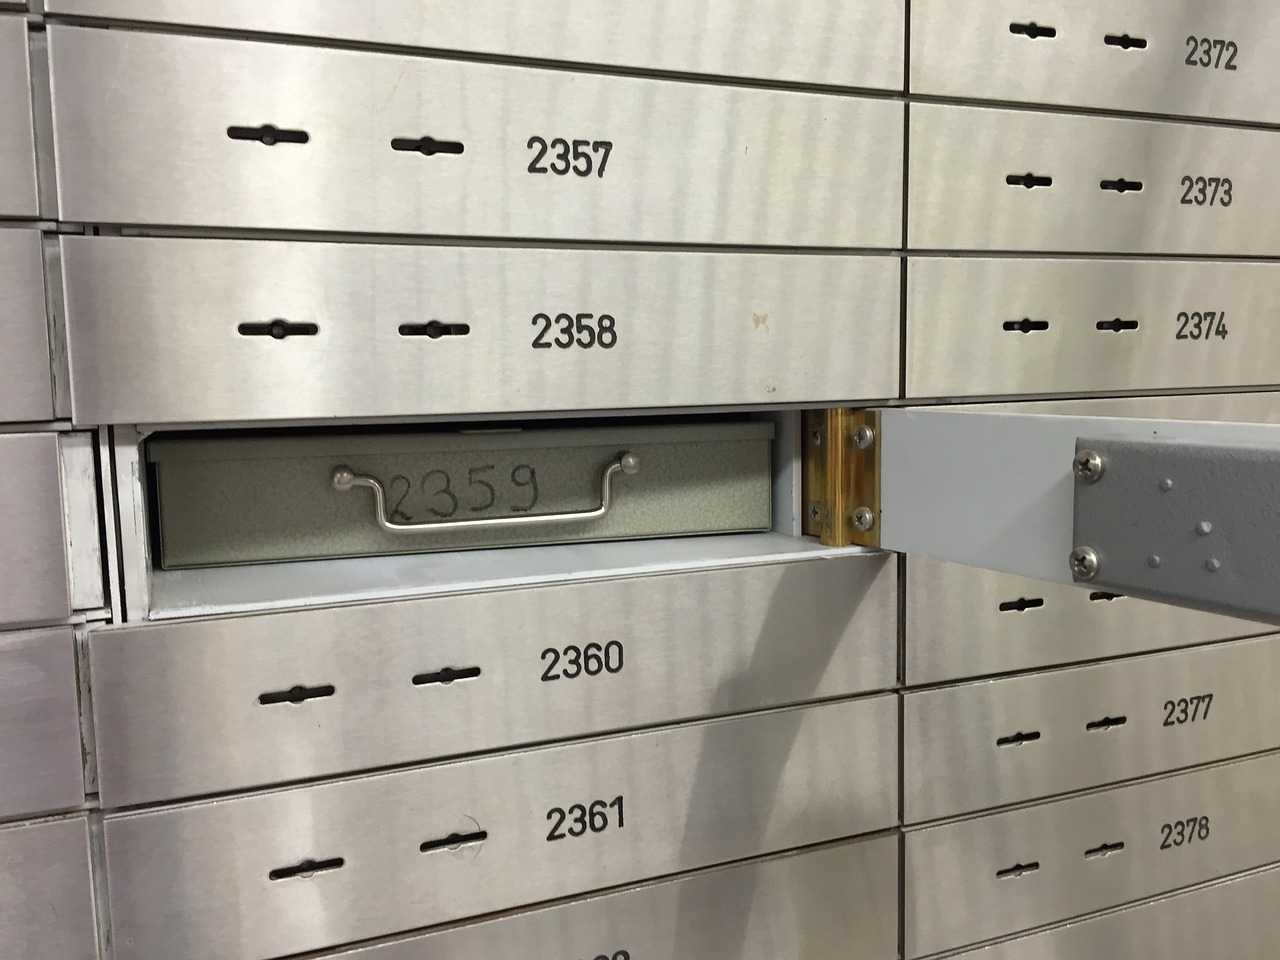 KPMG crypto-bewaardiensten